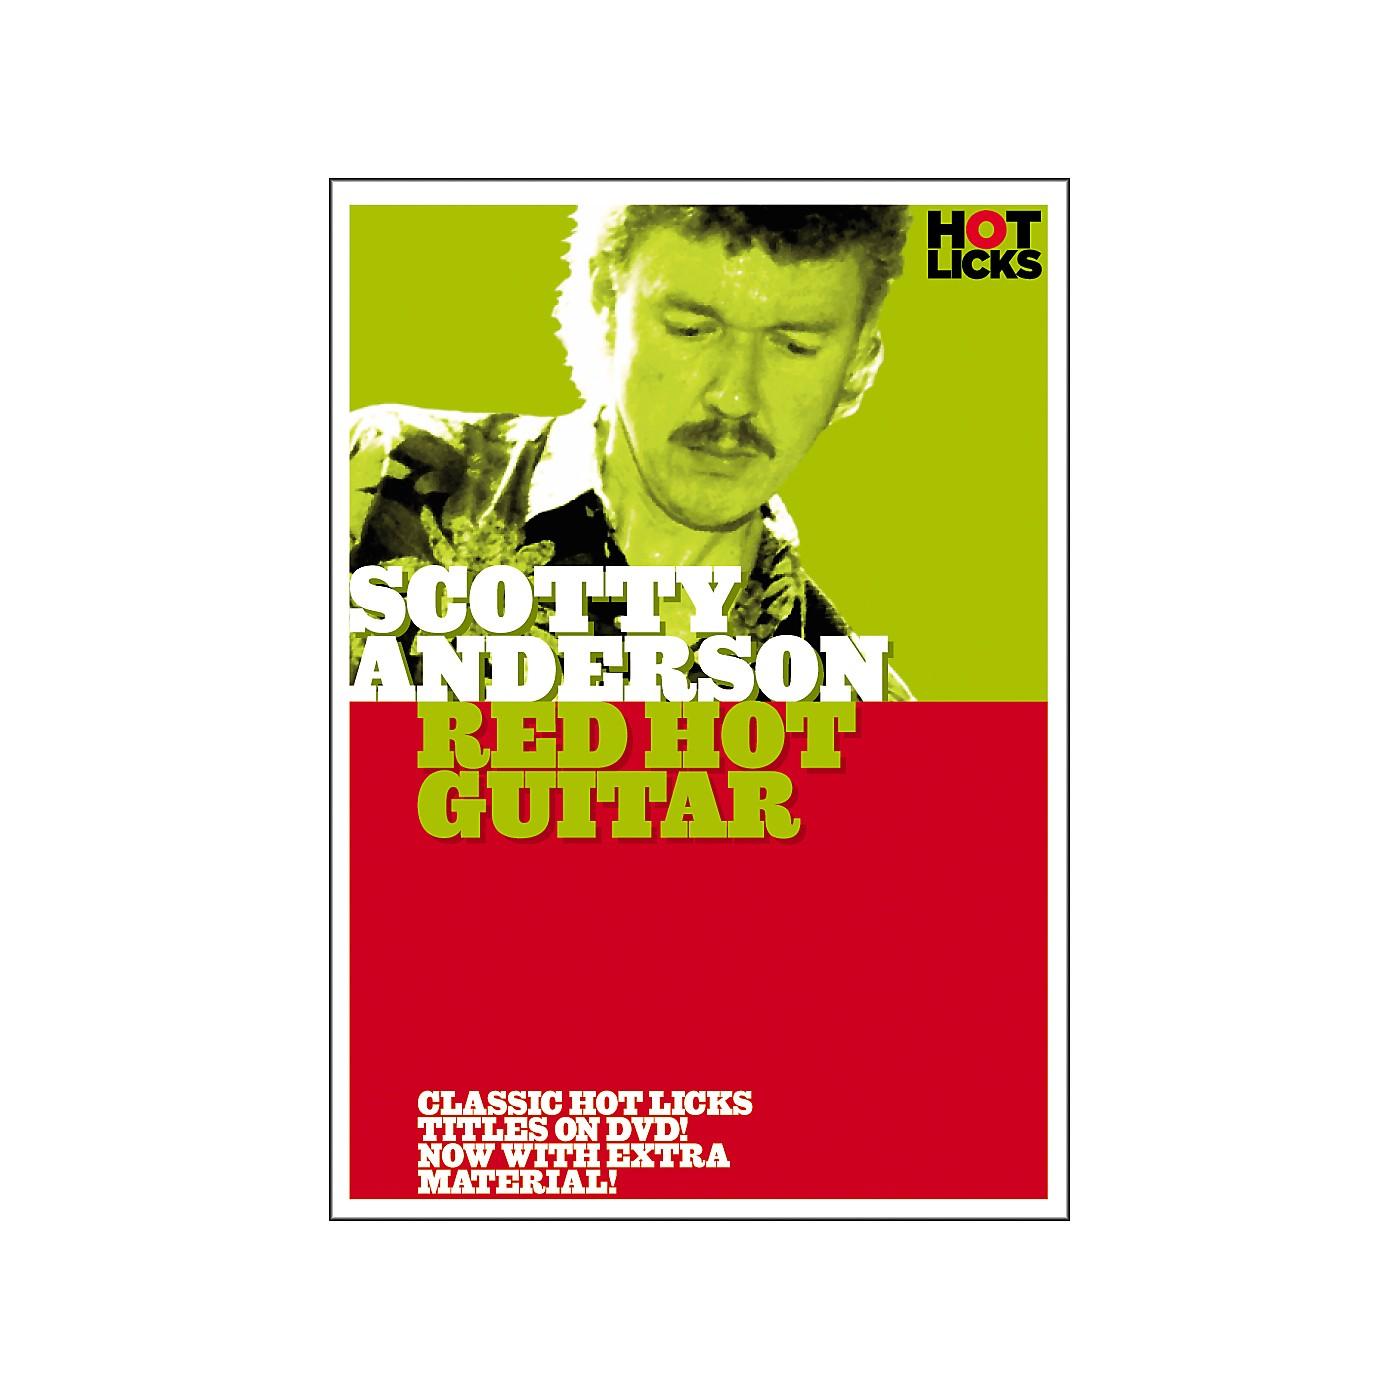 Hot Licks Scotty Anderson: Red Hot Guitar DVD thumbnail